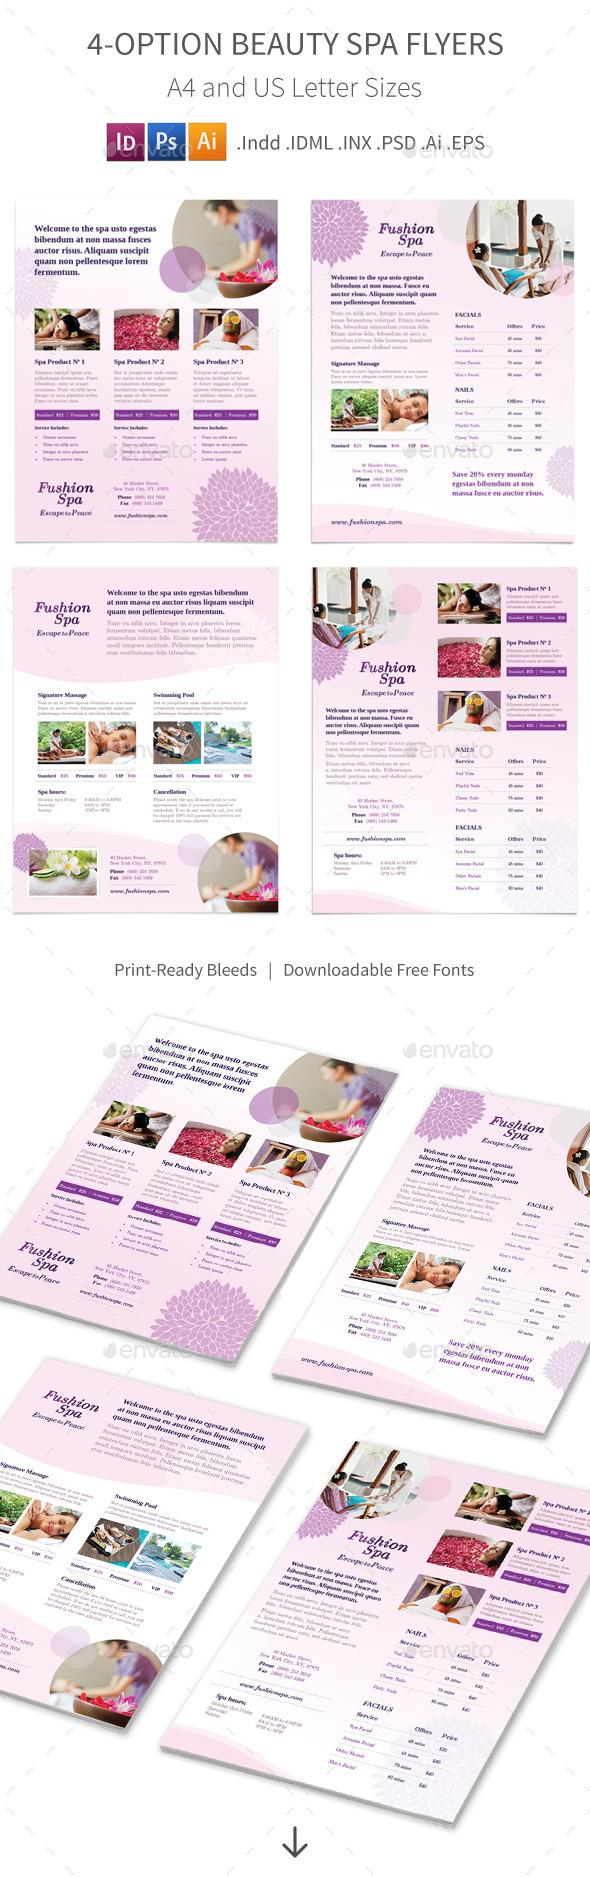 Beauty Spa Flyers – 4 Options - Commerce Flyers